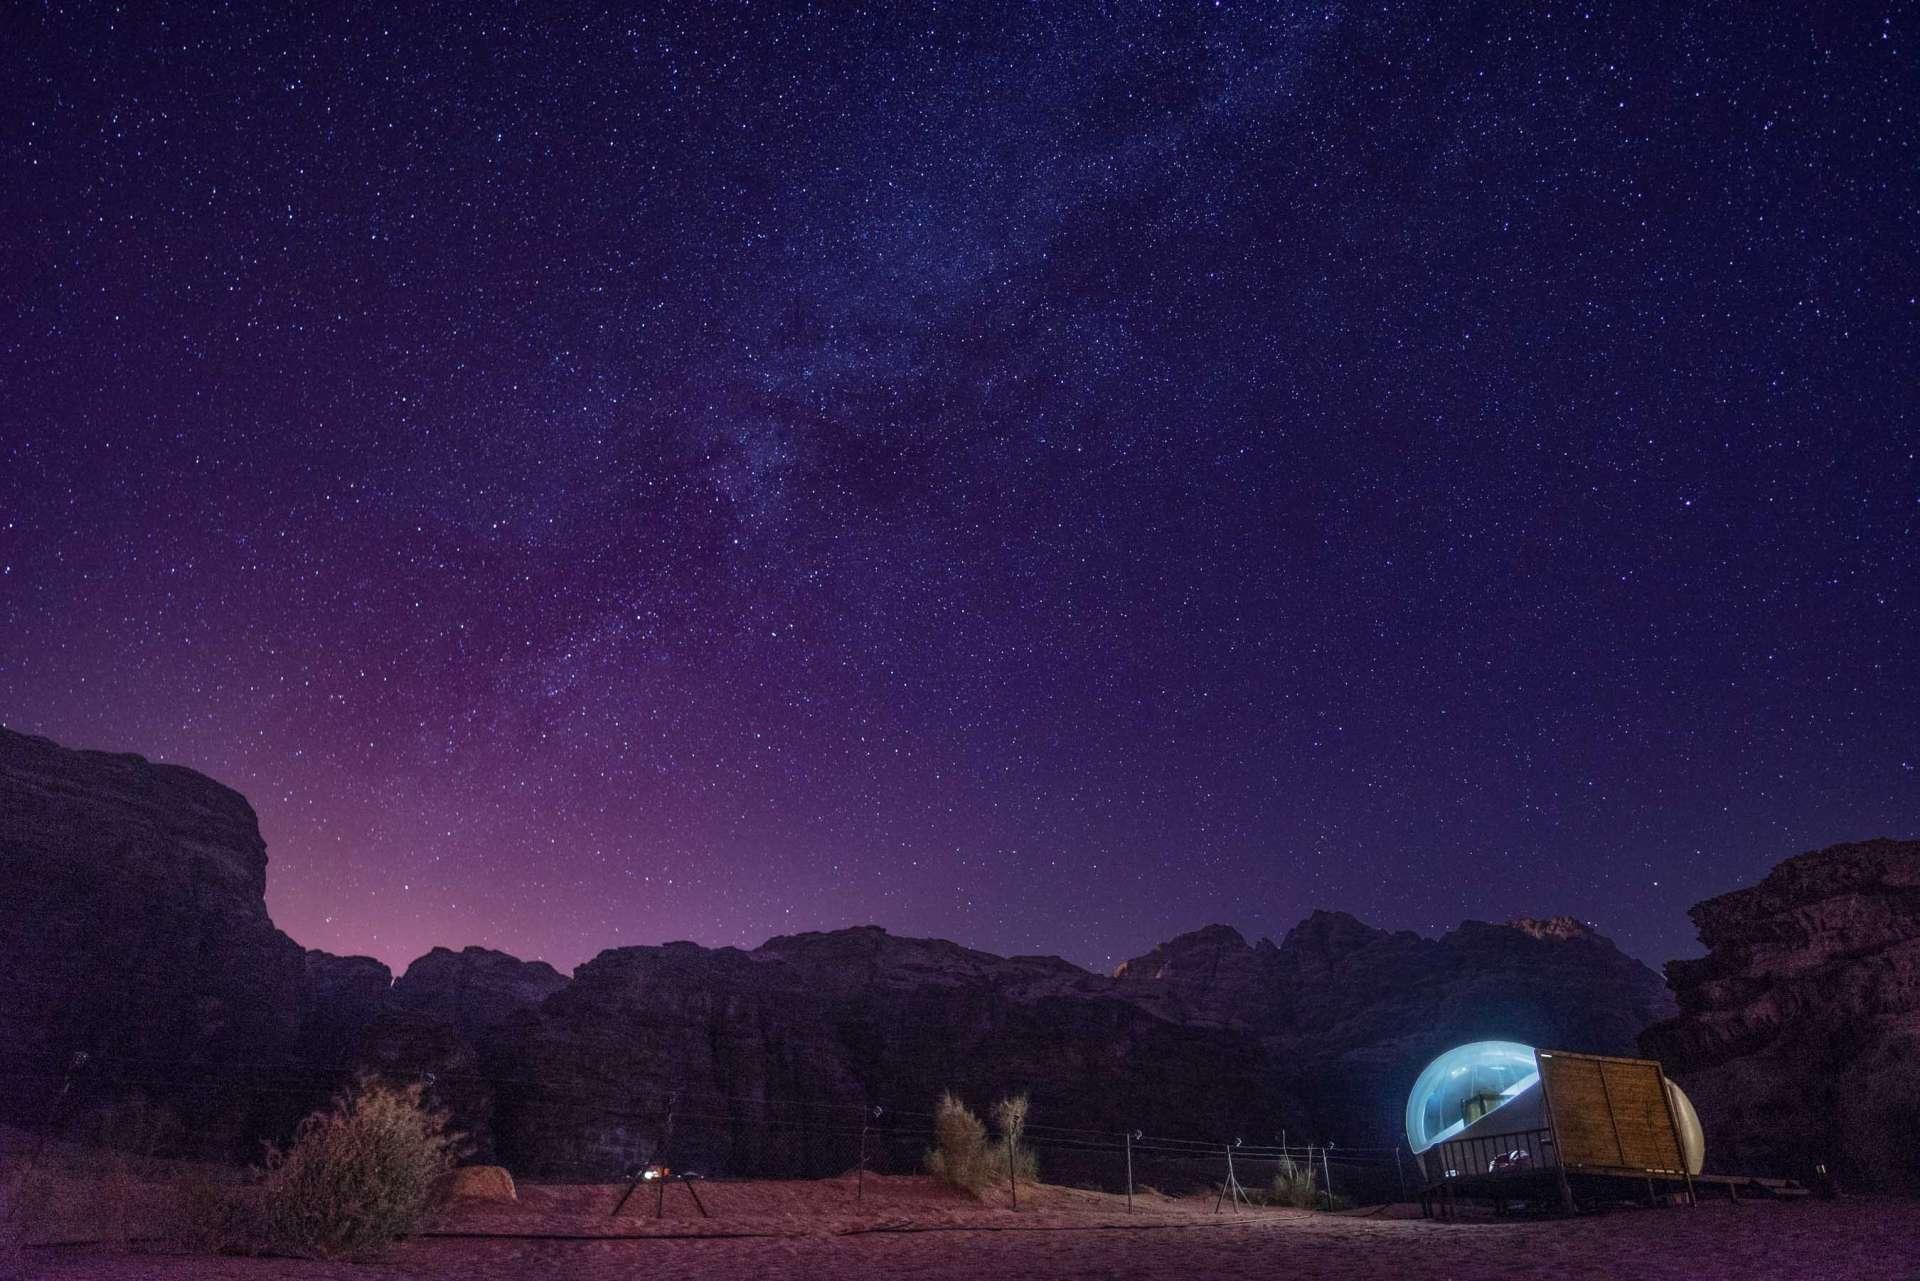 Wadi Rum Night Luxury Camp Full of Stars tent Jordan Enrico Pescantini stargazing stars milky way 3